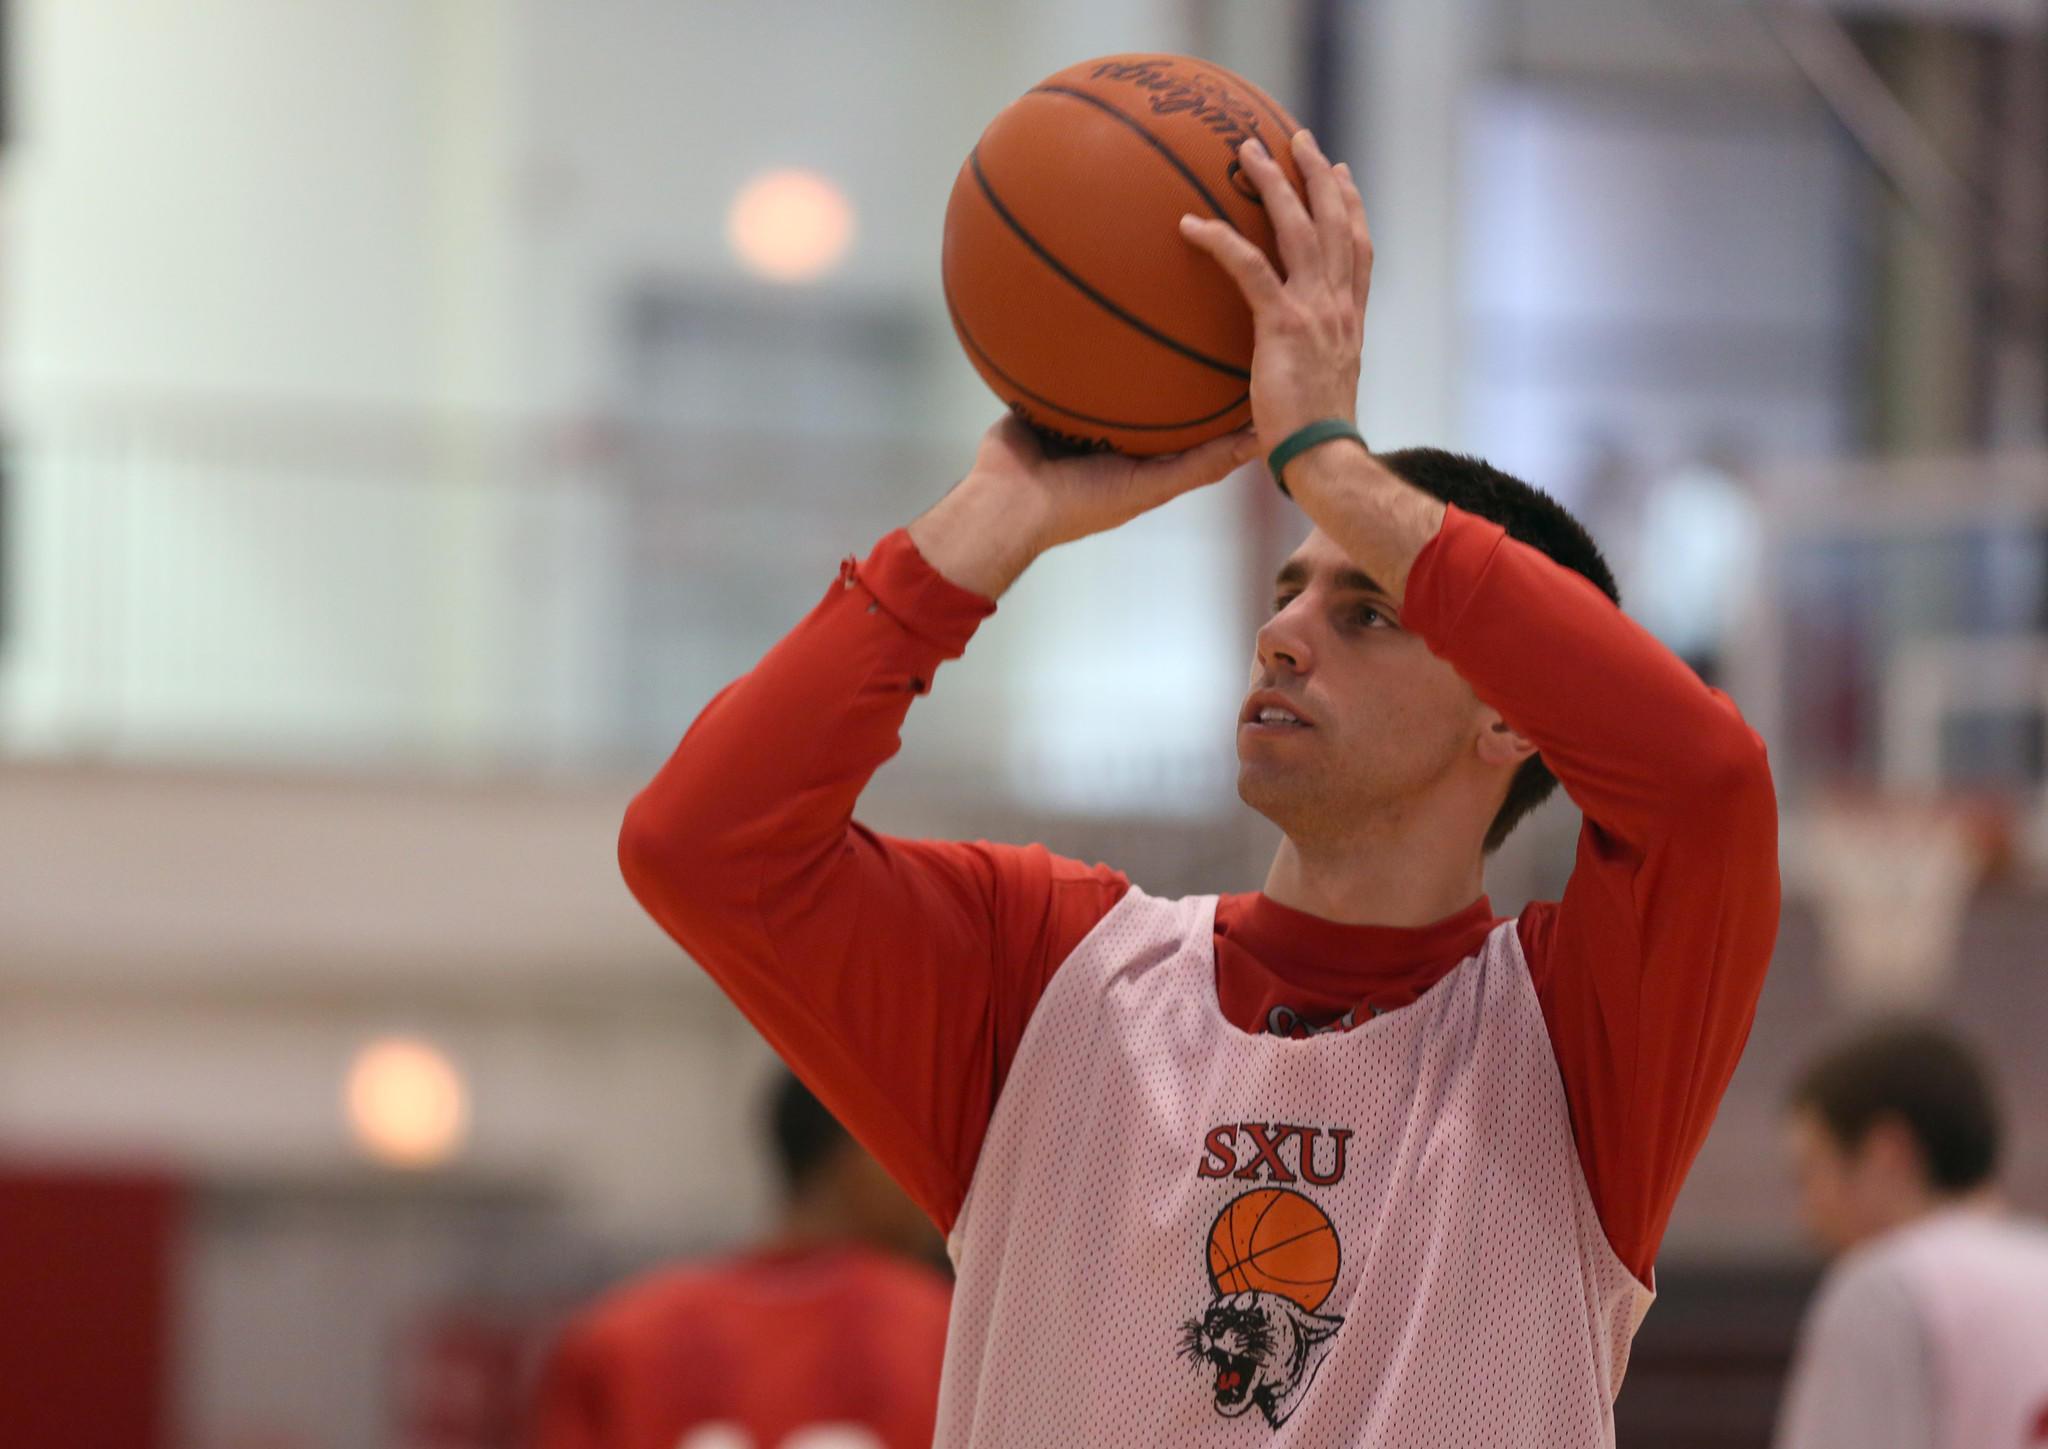 Saint Xavier's Brad Karp finished his career No. 4 on the state's collegiate career scoring list.